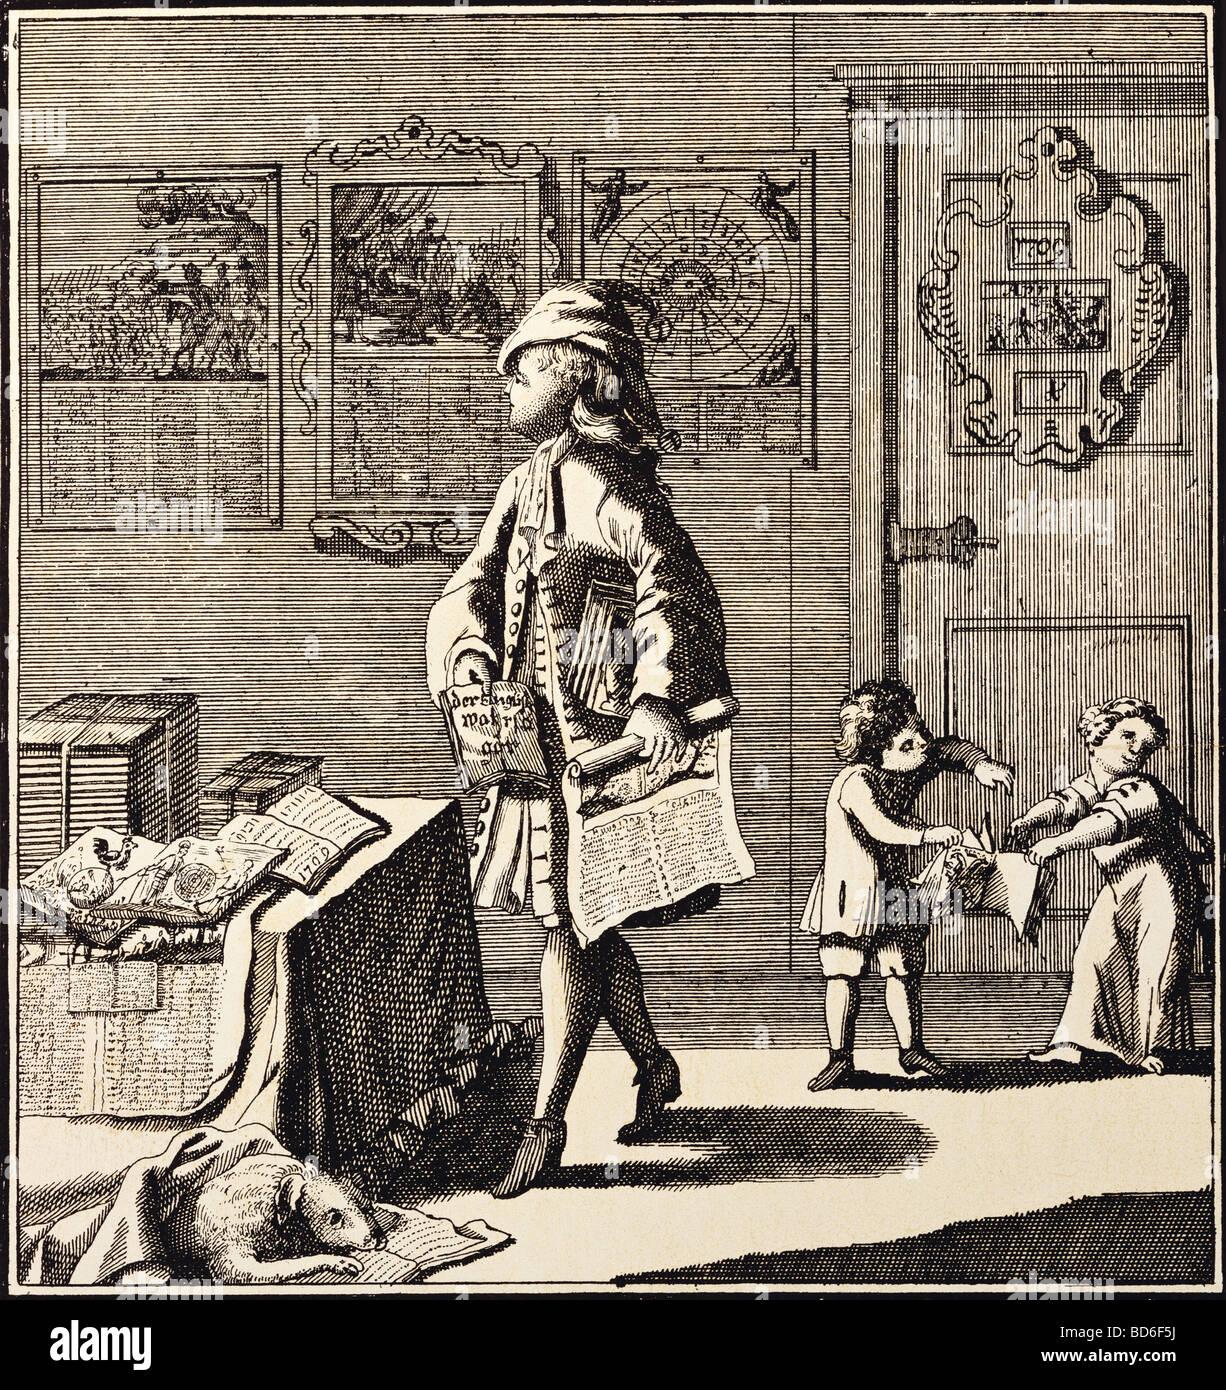 calendar, graphic, 'Der Kalender-Narr' (The calendar fool), caricature, copper engraving, by Christoph Weigel, - Stock Image